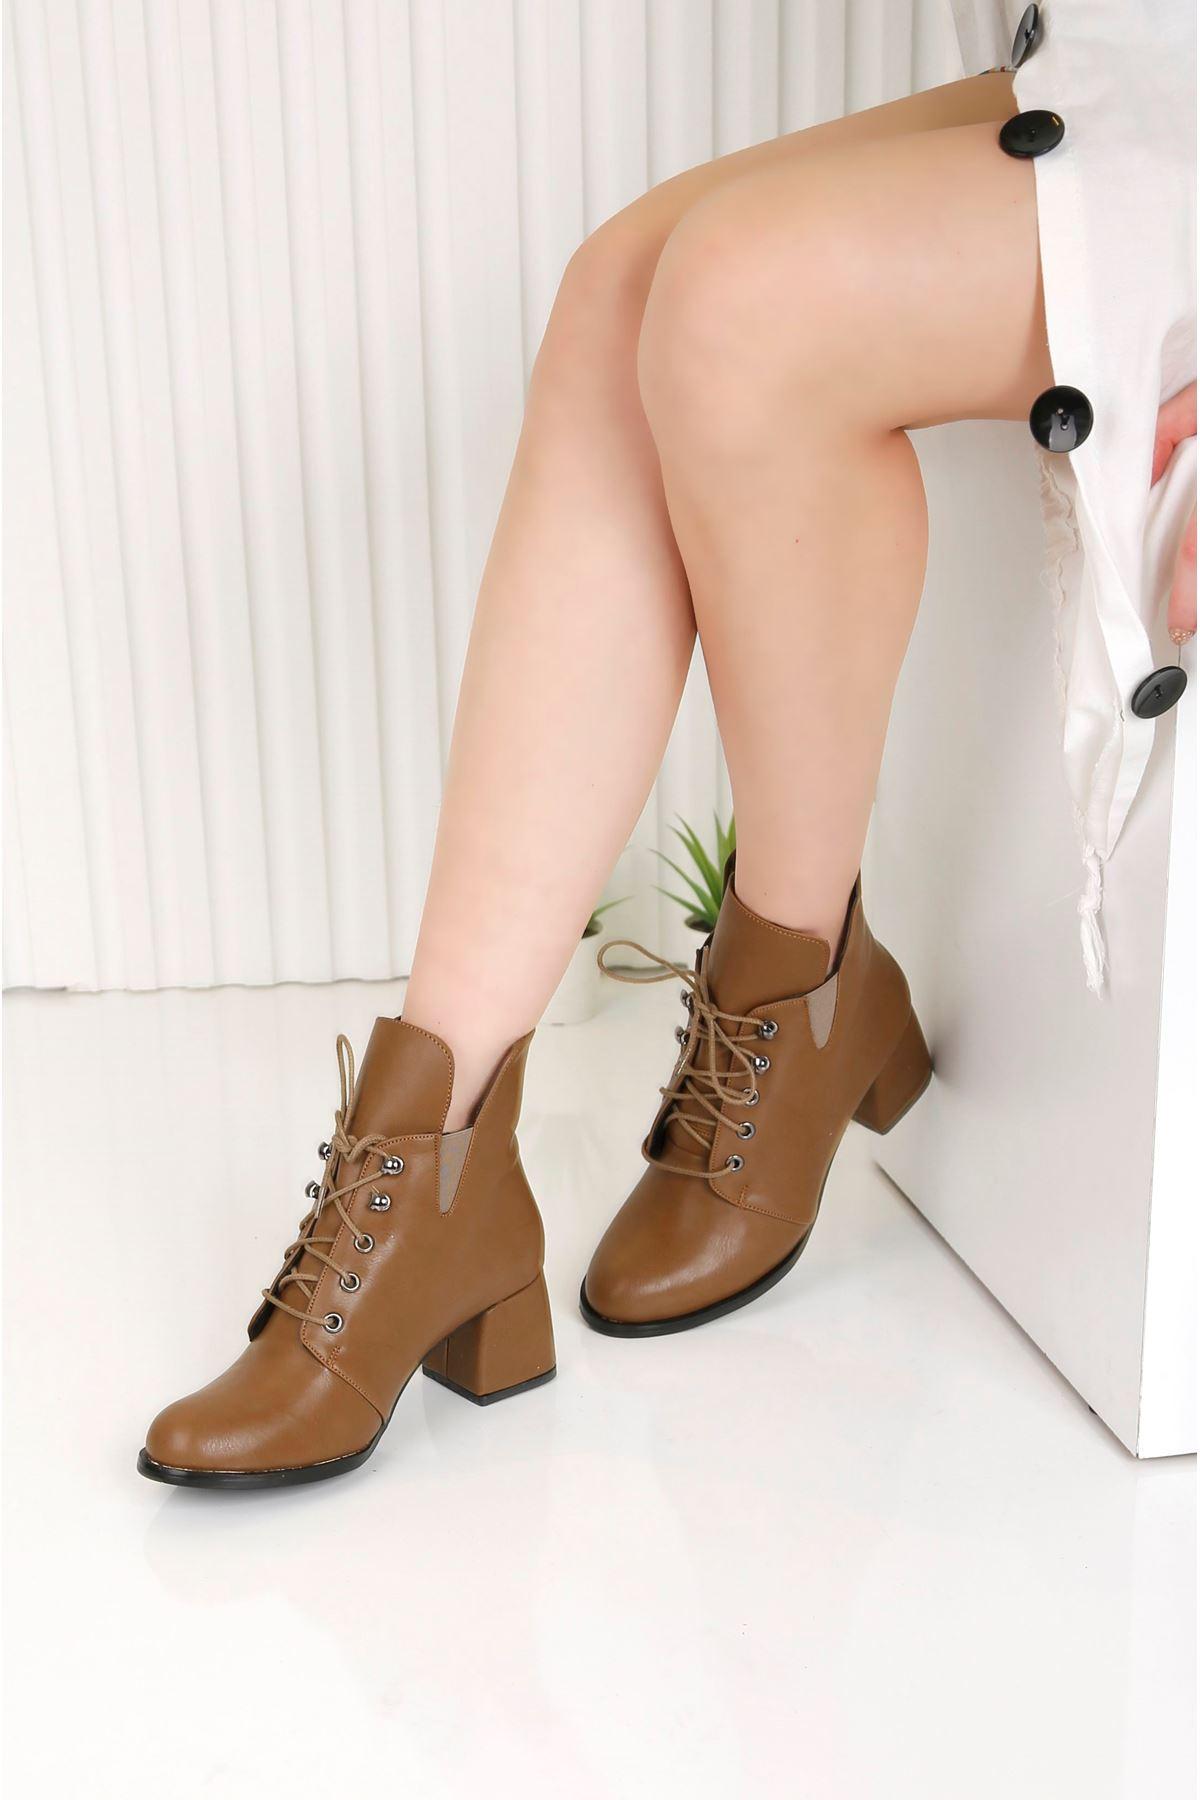 TRAUM Taba Topuklu Kadın Bot